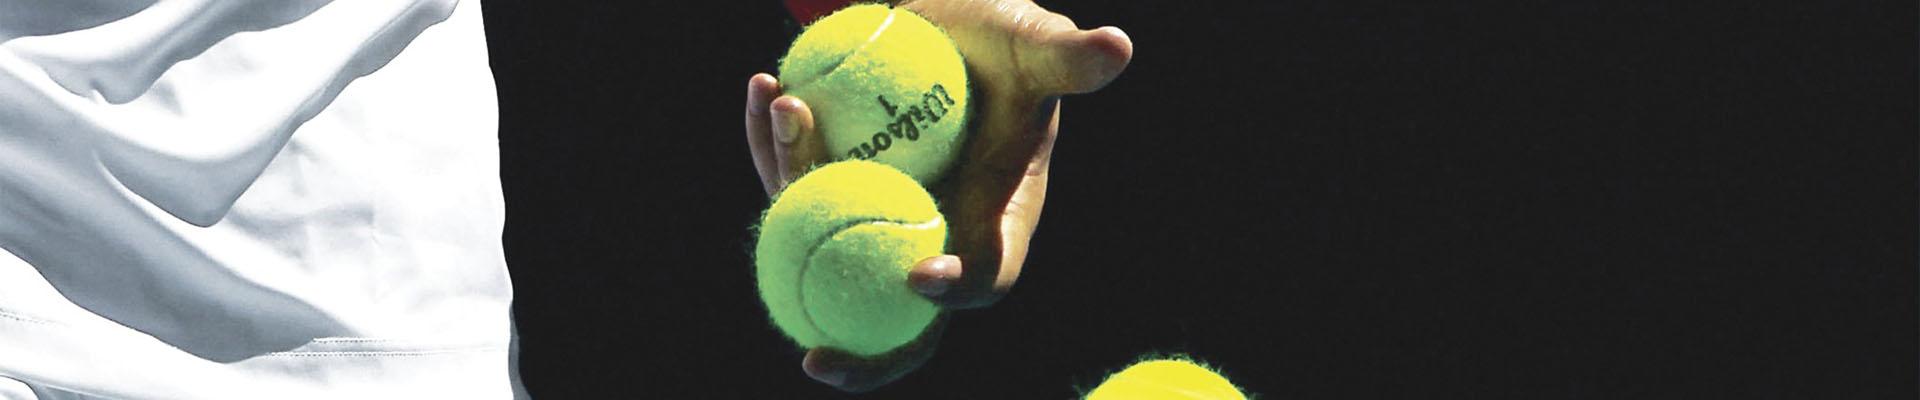 Espoon-tennisseura-slide11